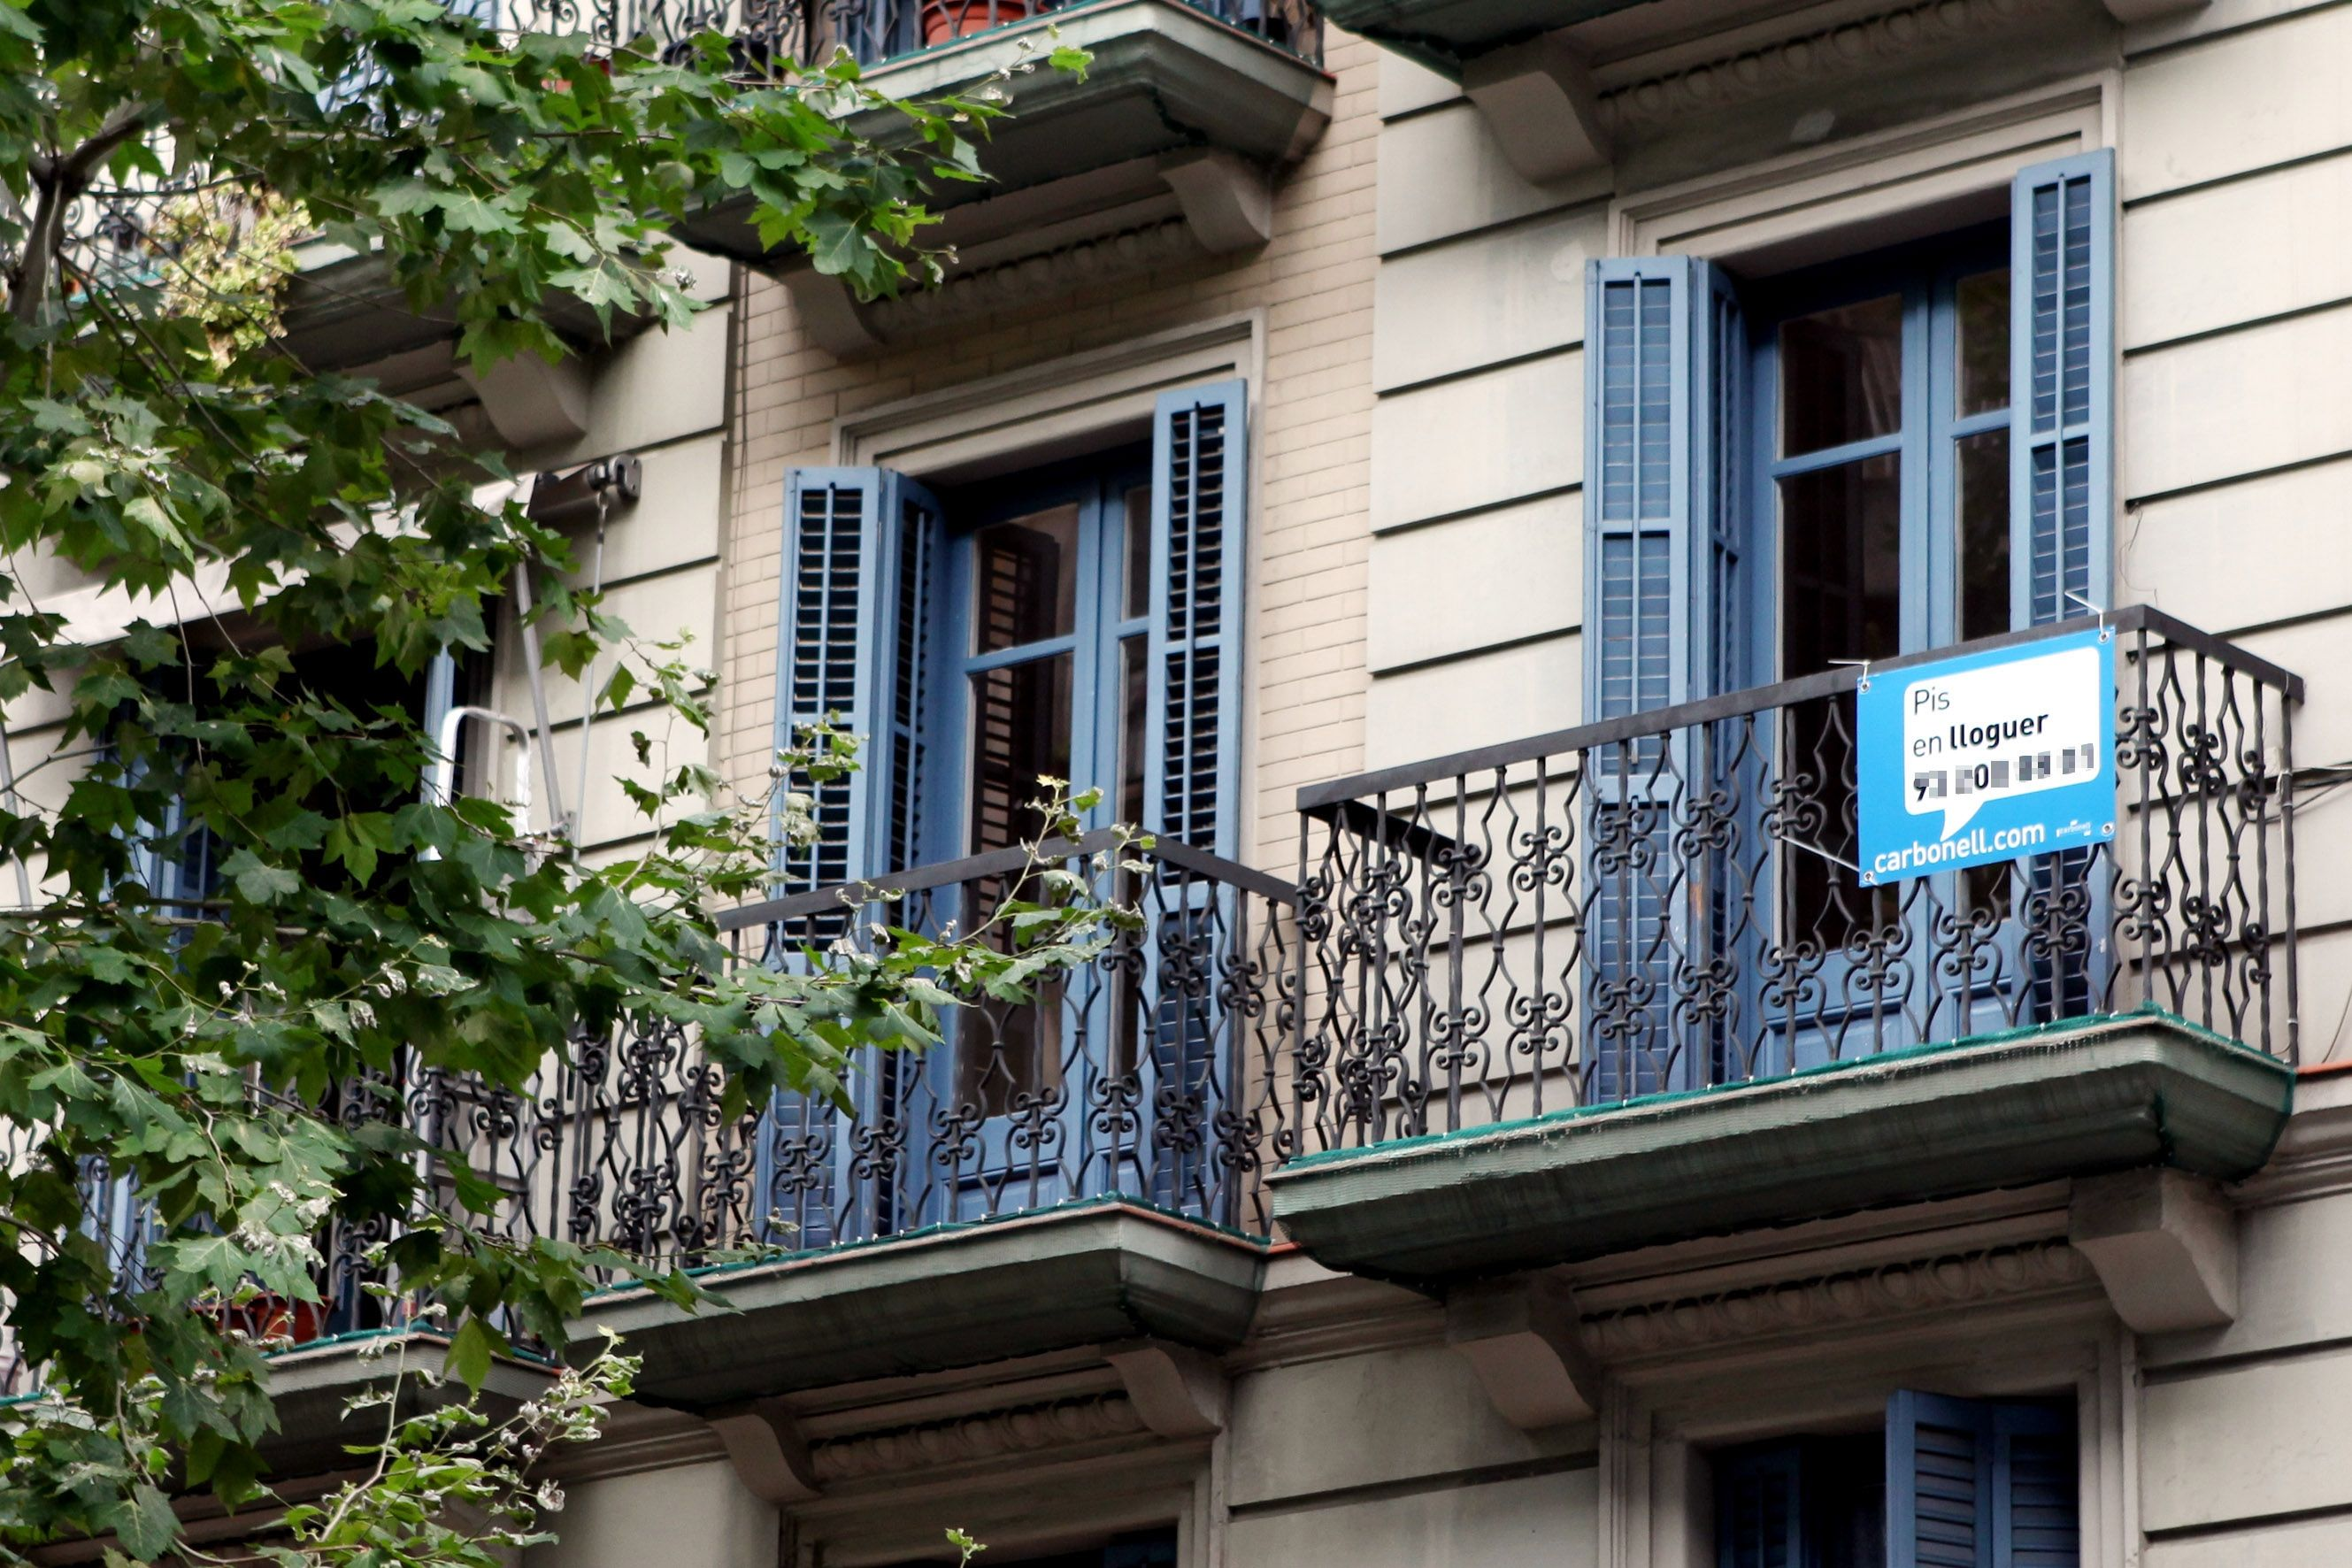 Barcelona es busca pis per euros - Lloguer pis barcelona particular ...